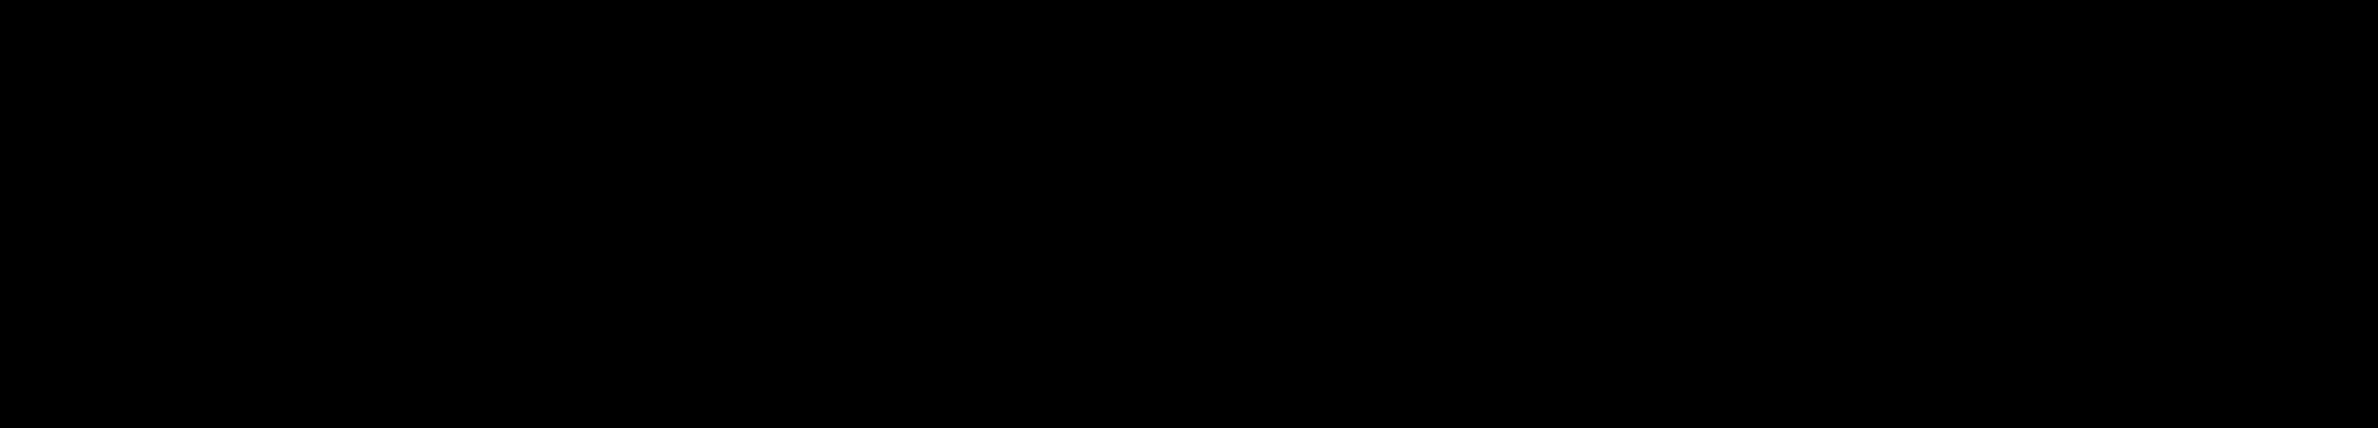 Banner & Witcoff, Ltd